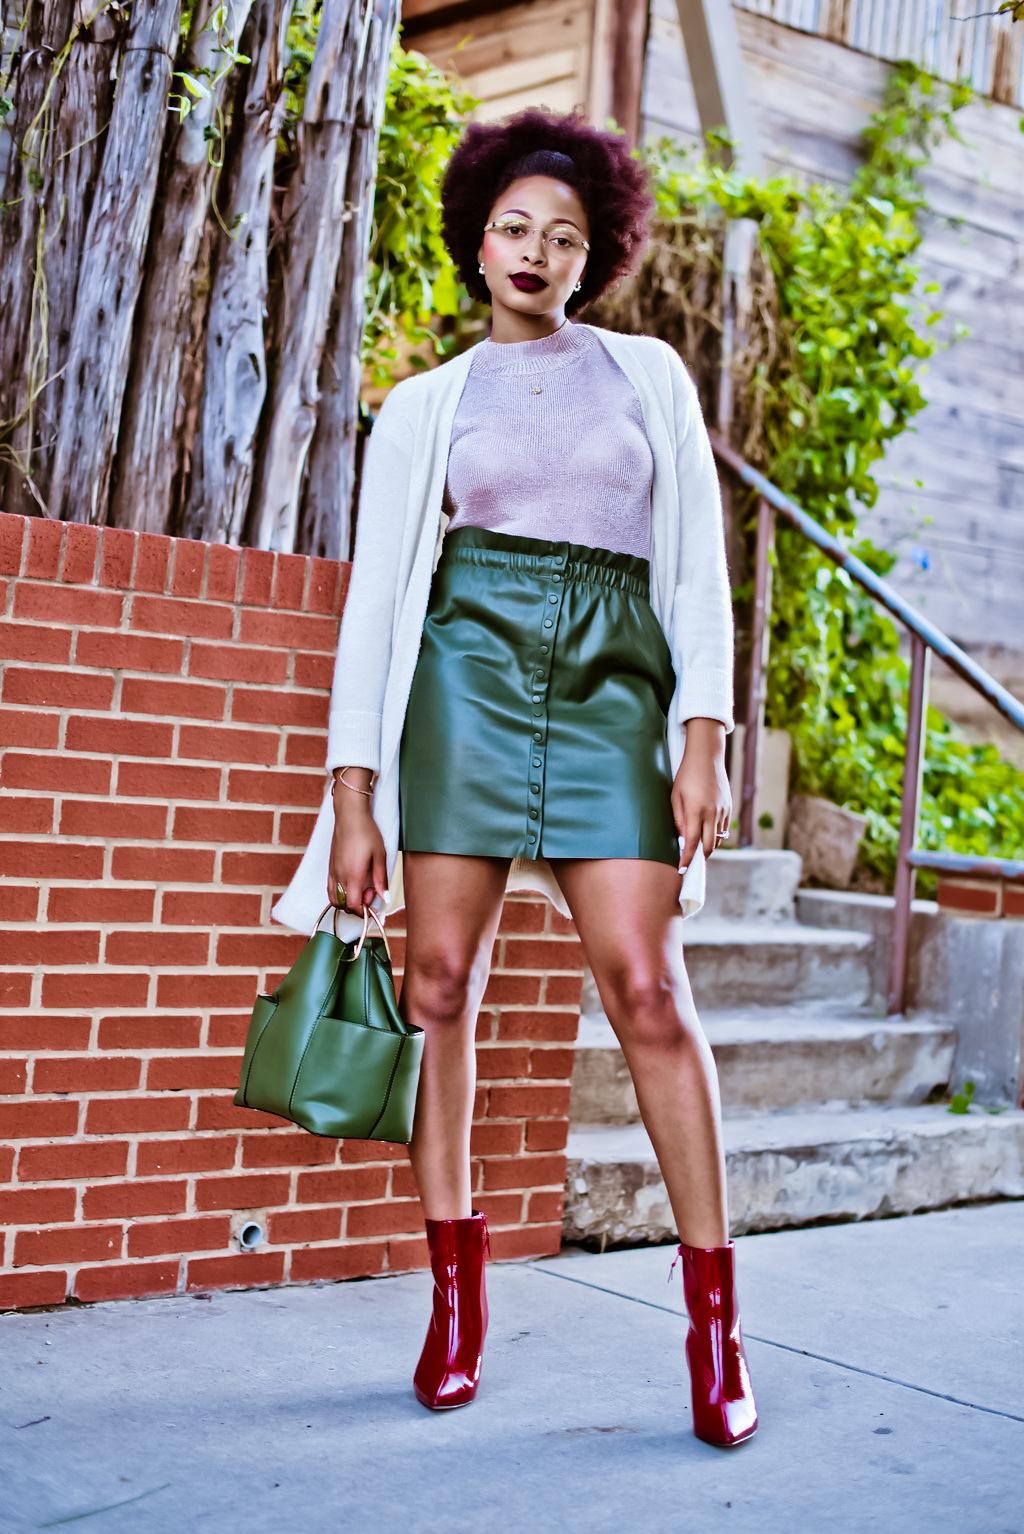 Dallas street style blogger